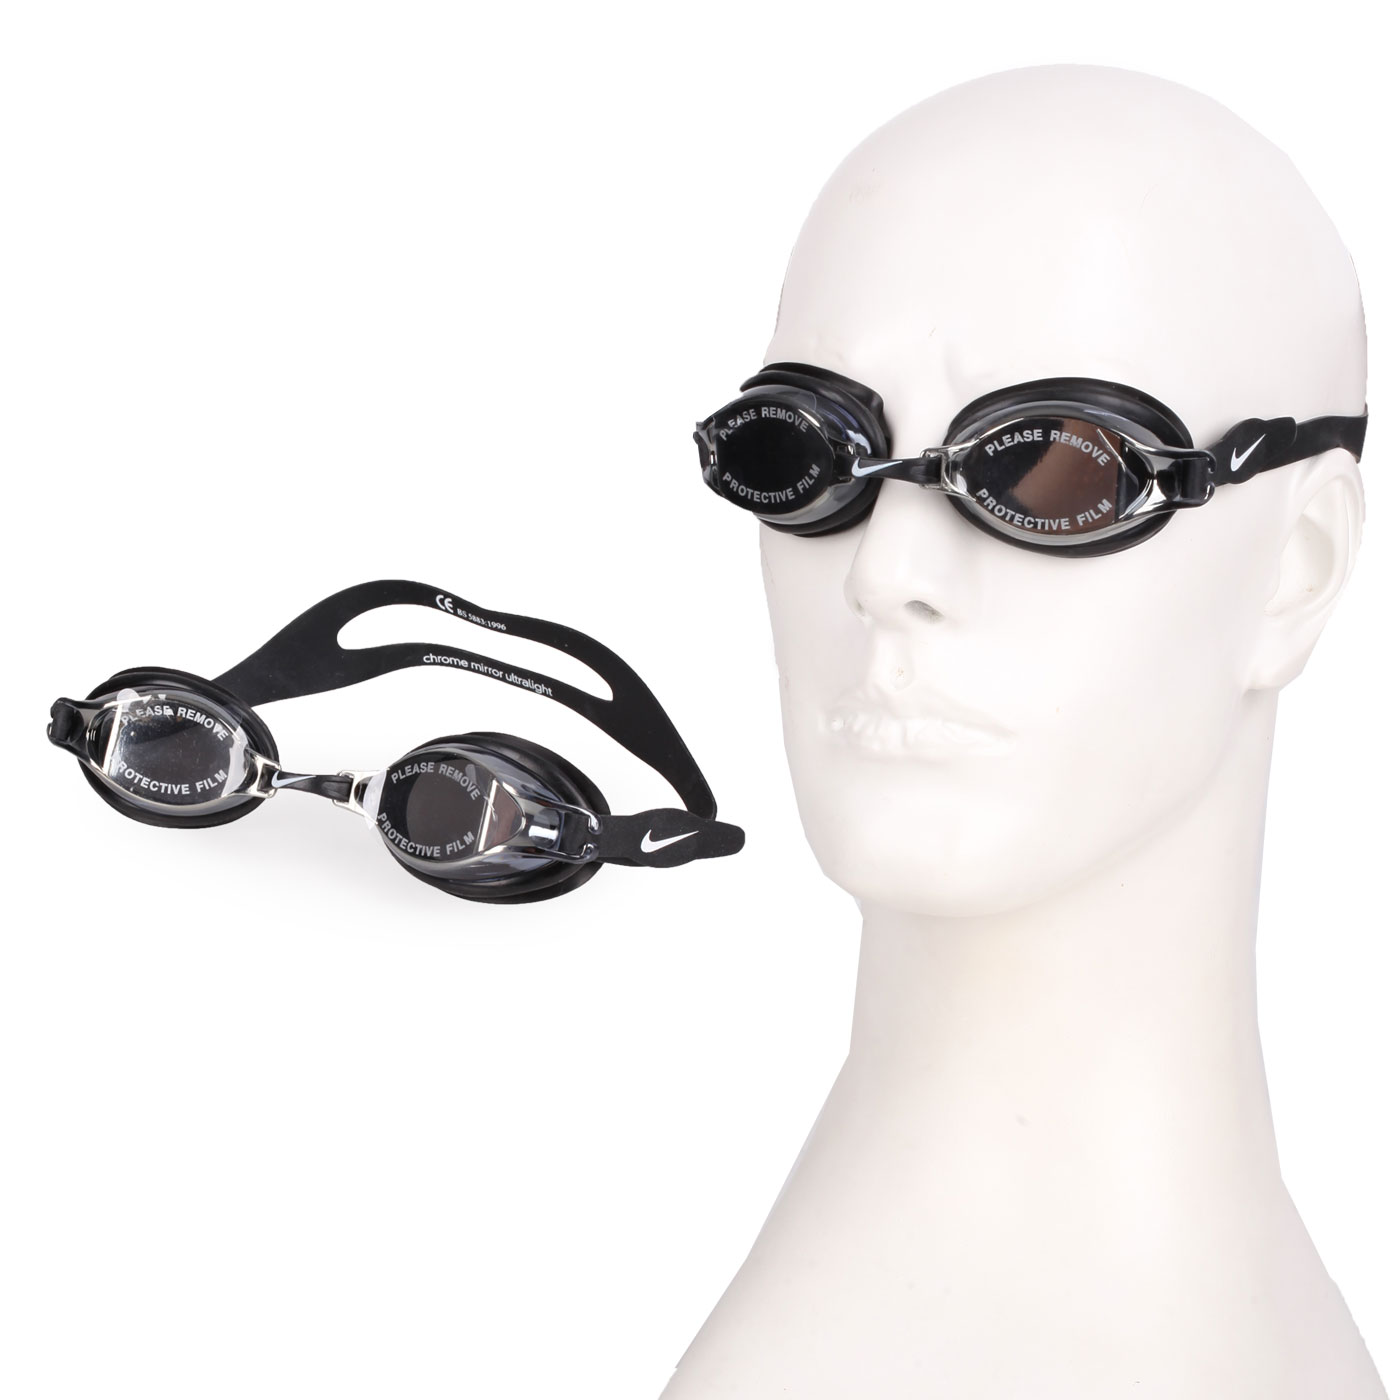 NIKE SWIM 訓練型成人泳鏡 NESS7152-001 - 黑白